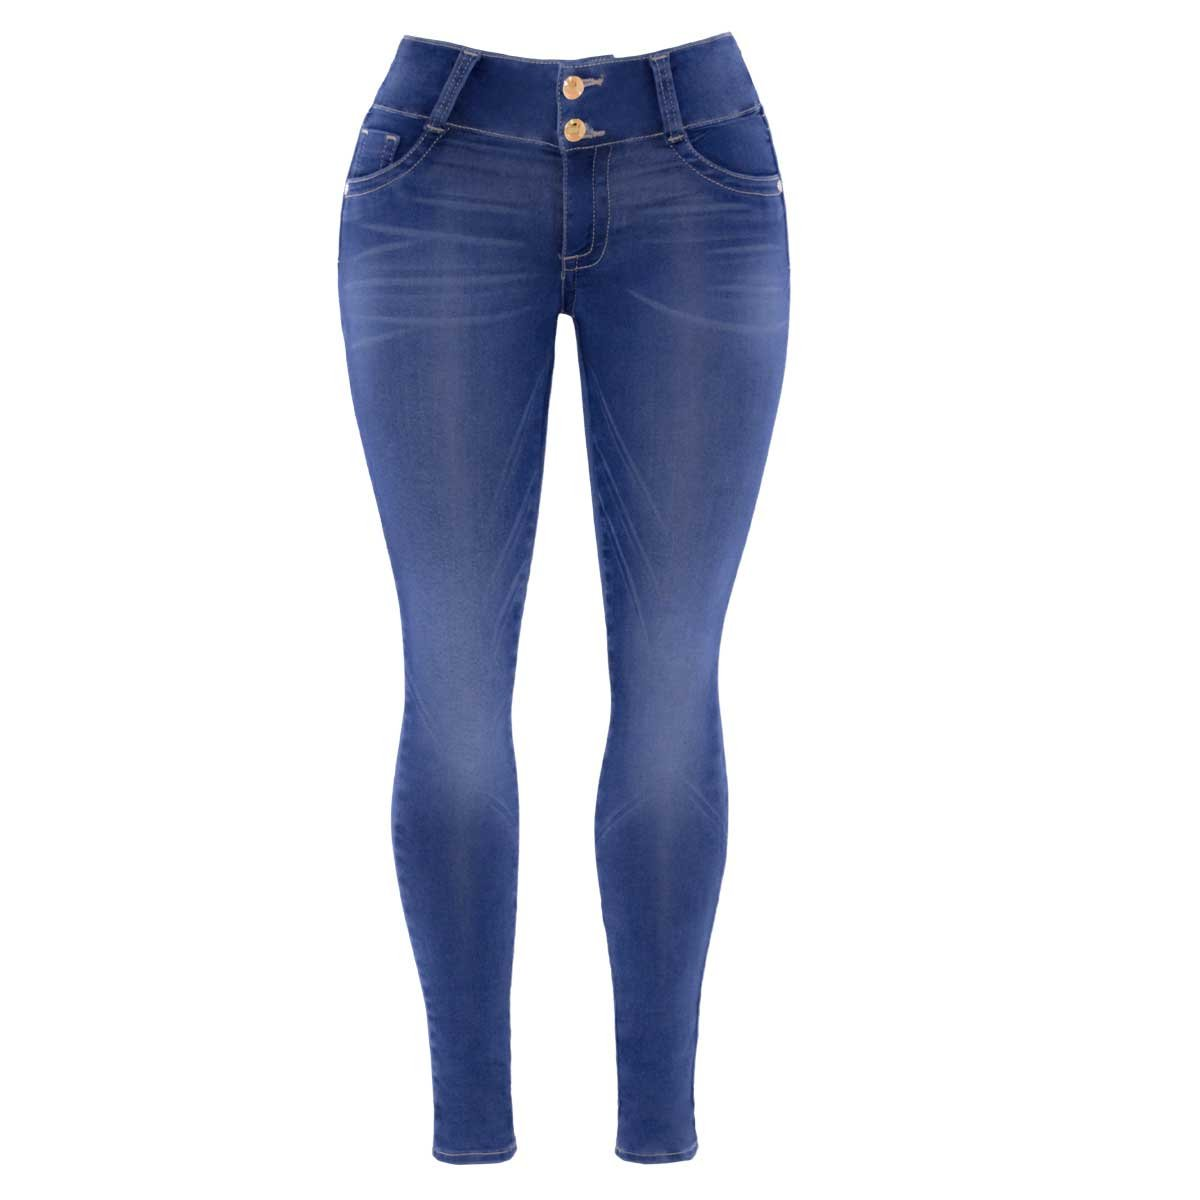 Sears Tiene Lo Mejor En Pantalon Sin Bolsas Ciclon Jeans Para Dama Sears Com Mx